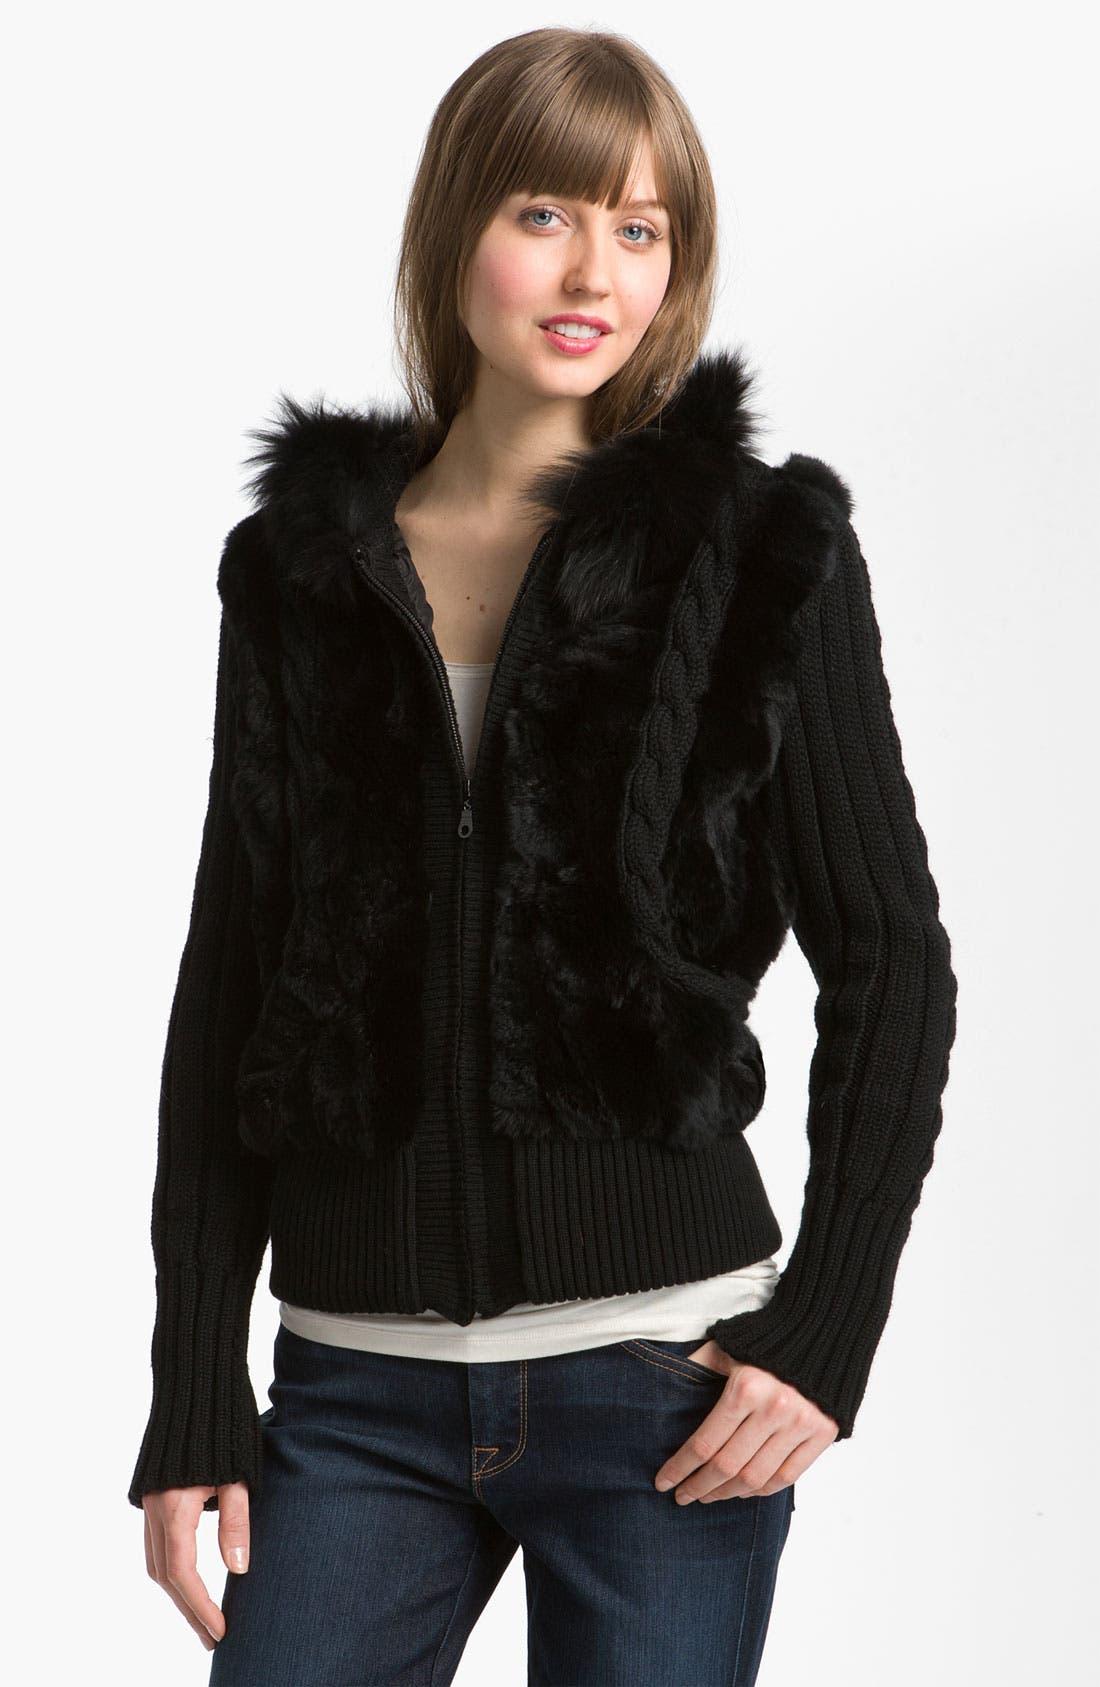 Main Image - Laundry by Shelli Segal Genuine Fur Trim Hooded Knit Jacket